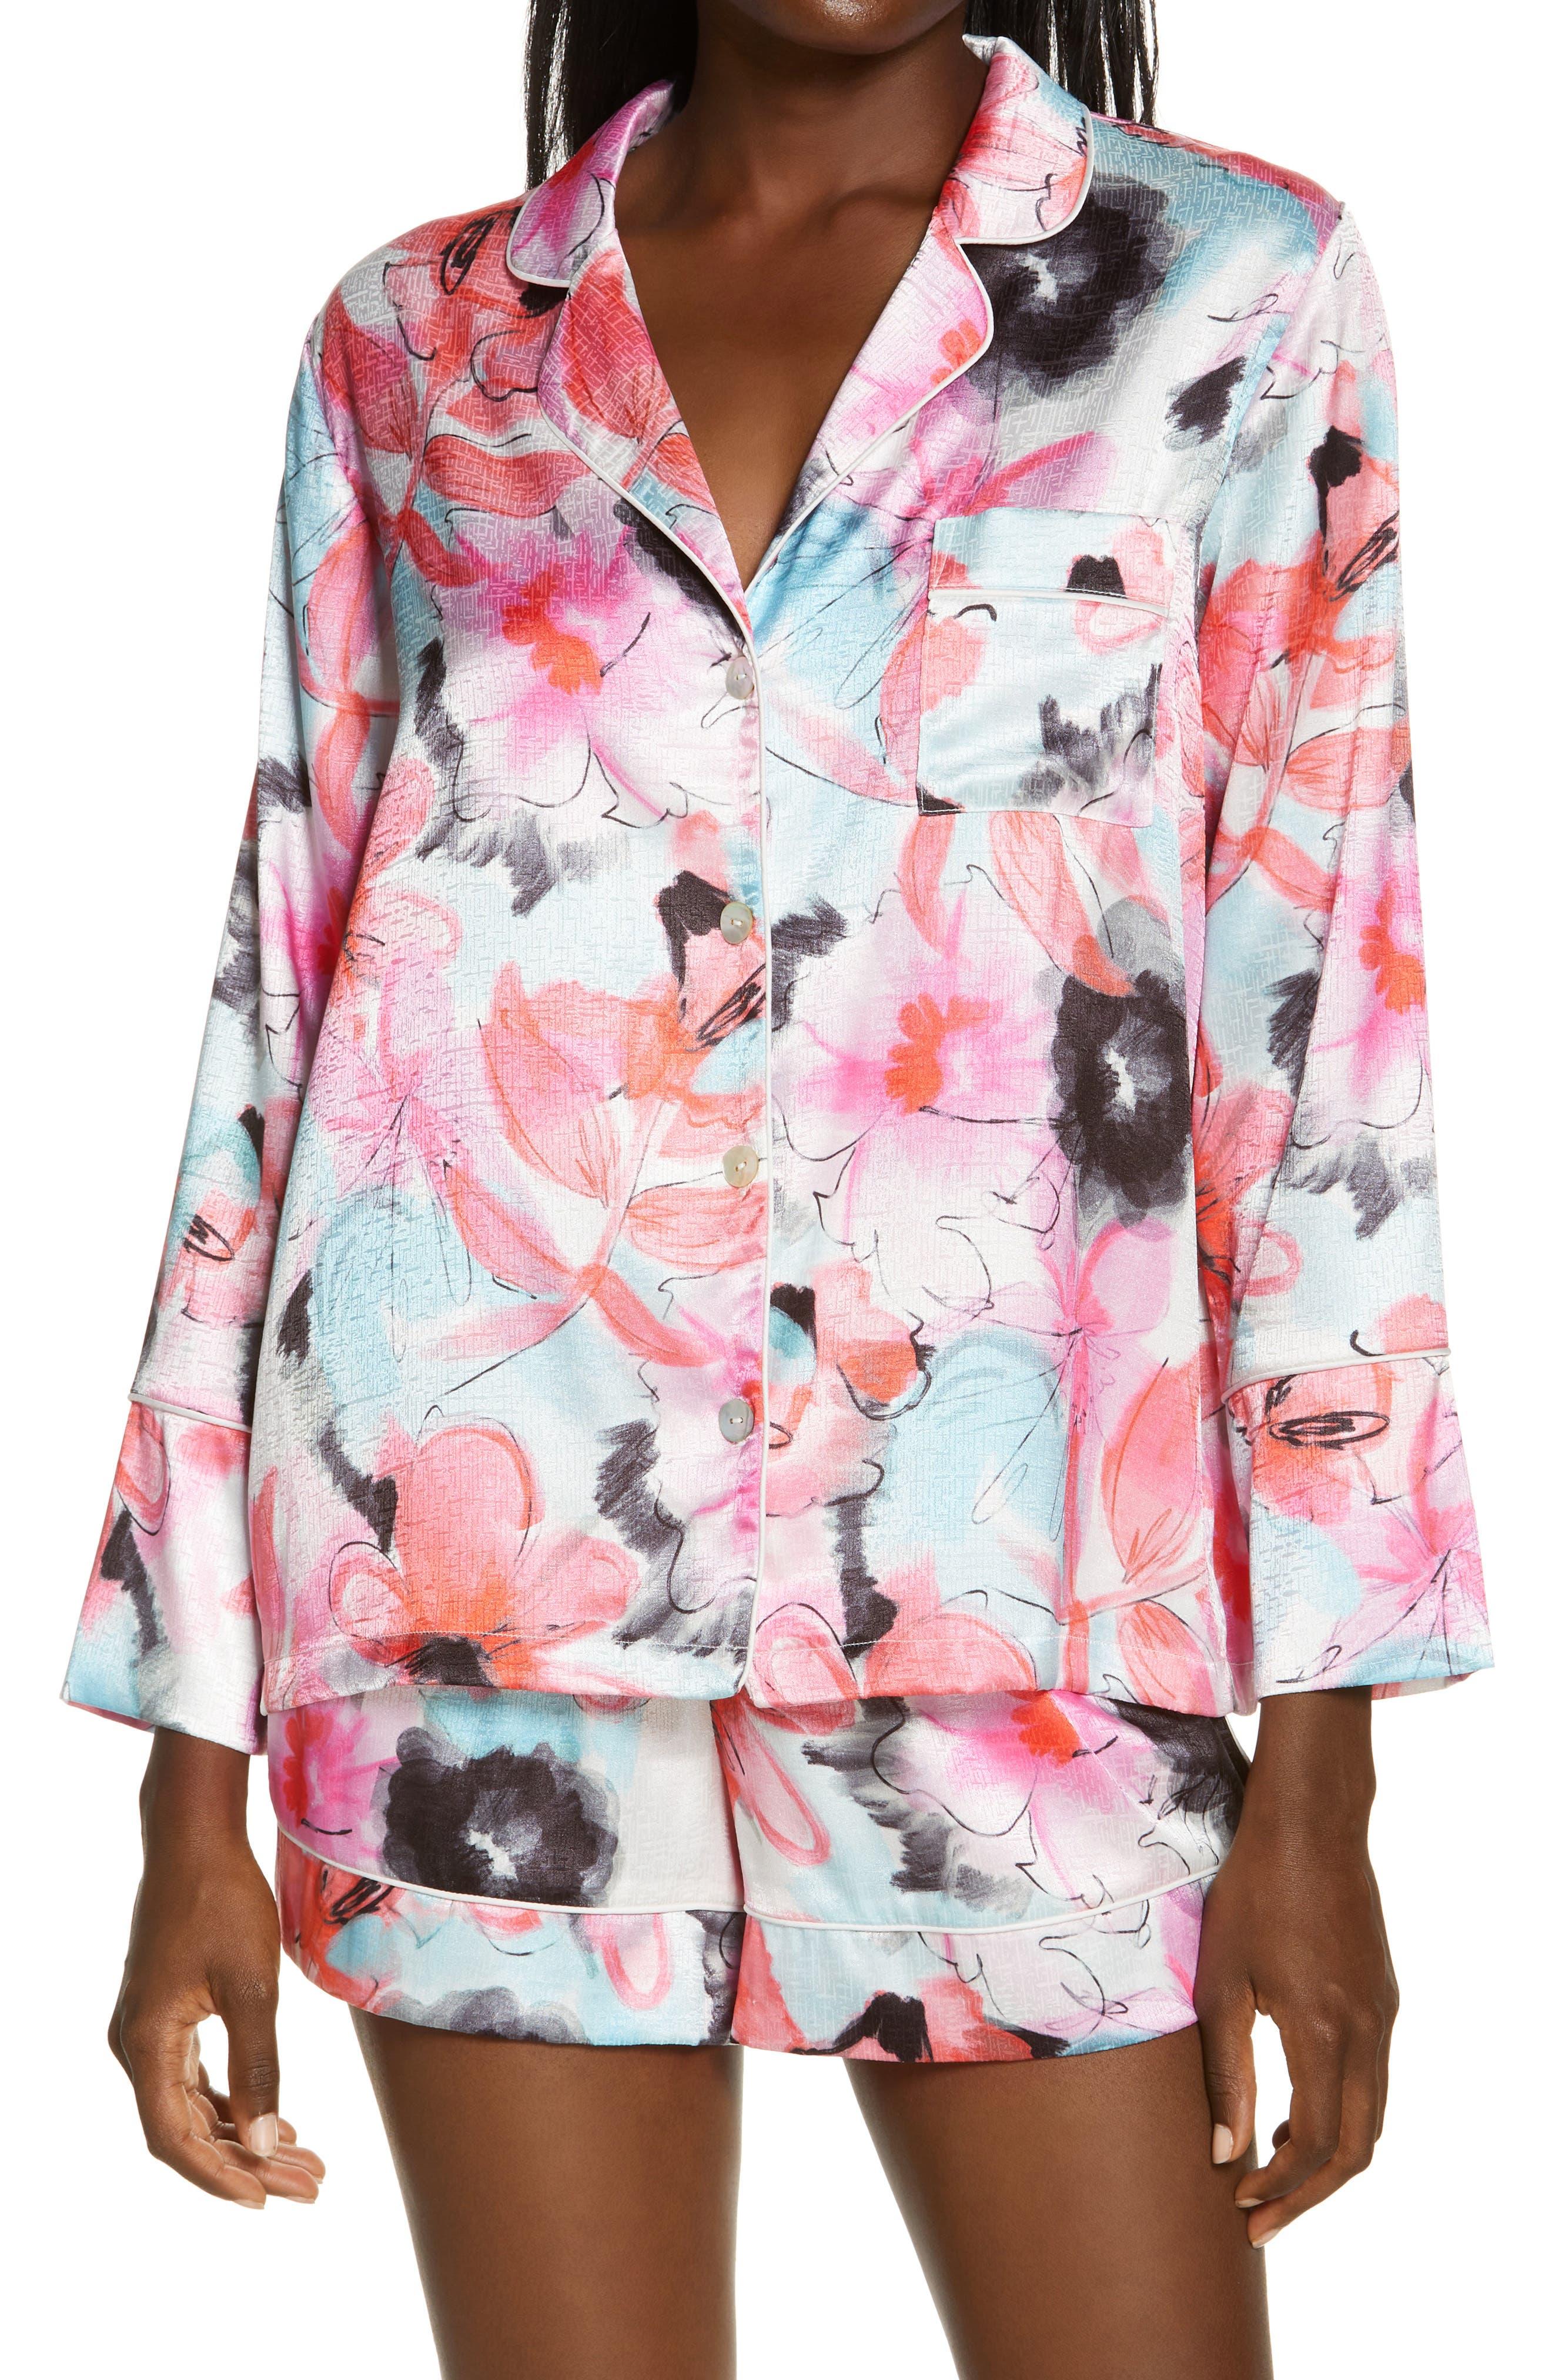 Floral Jacquard Short Satin Pajamas